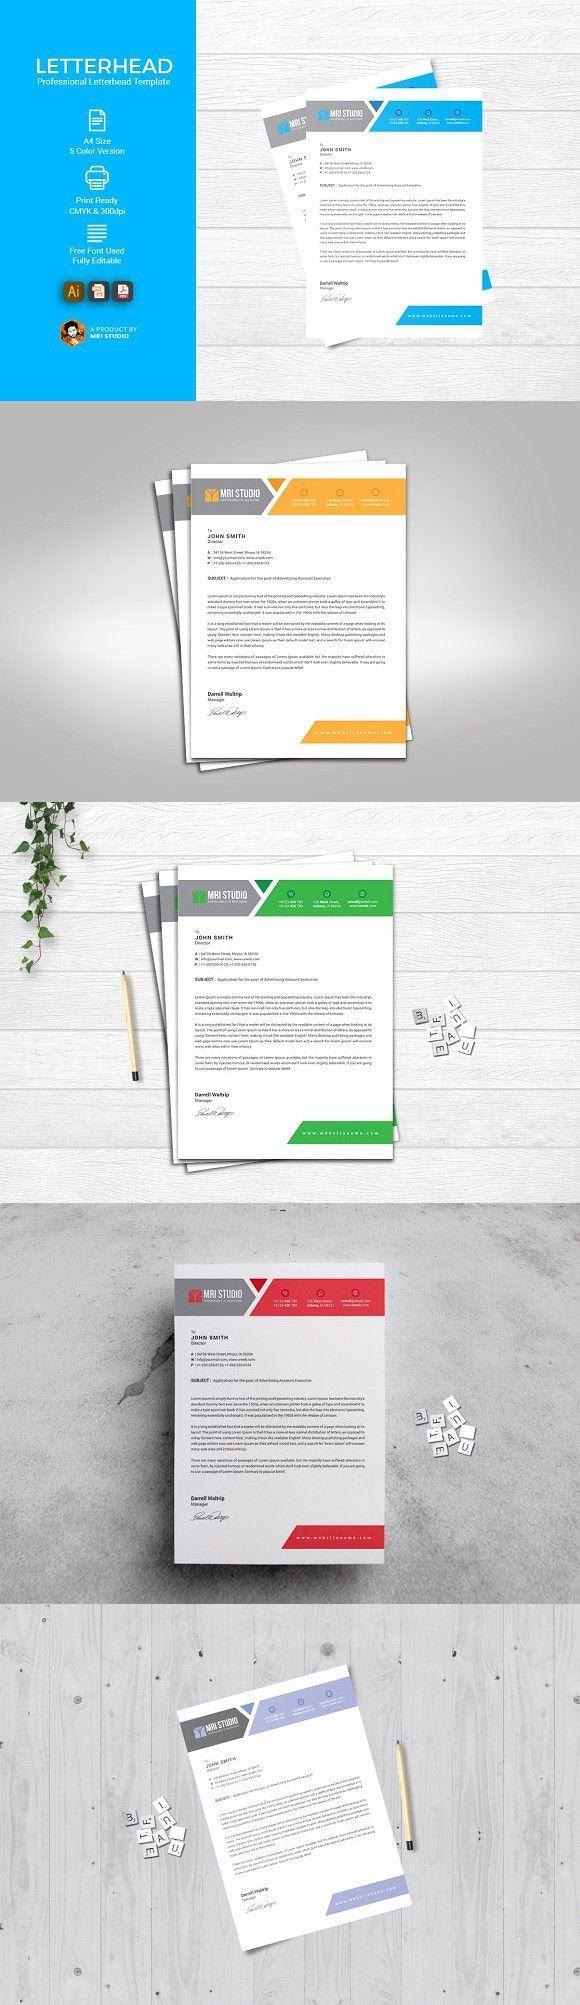 Simple Letterhead Template. Stationery Templates